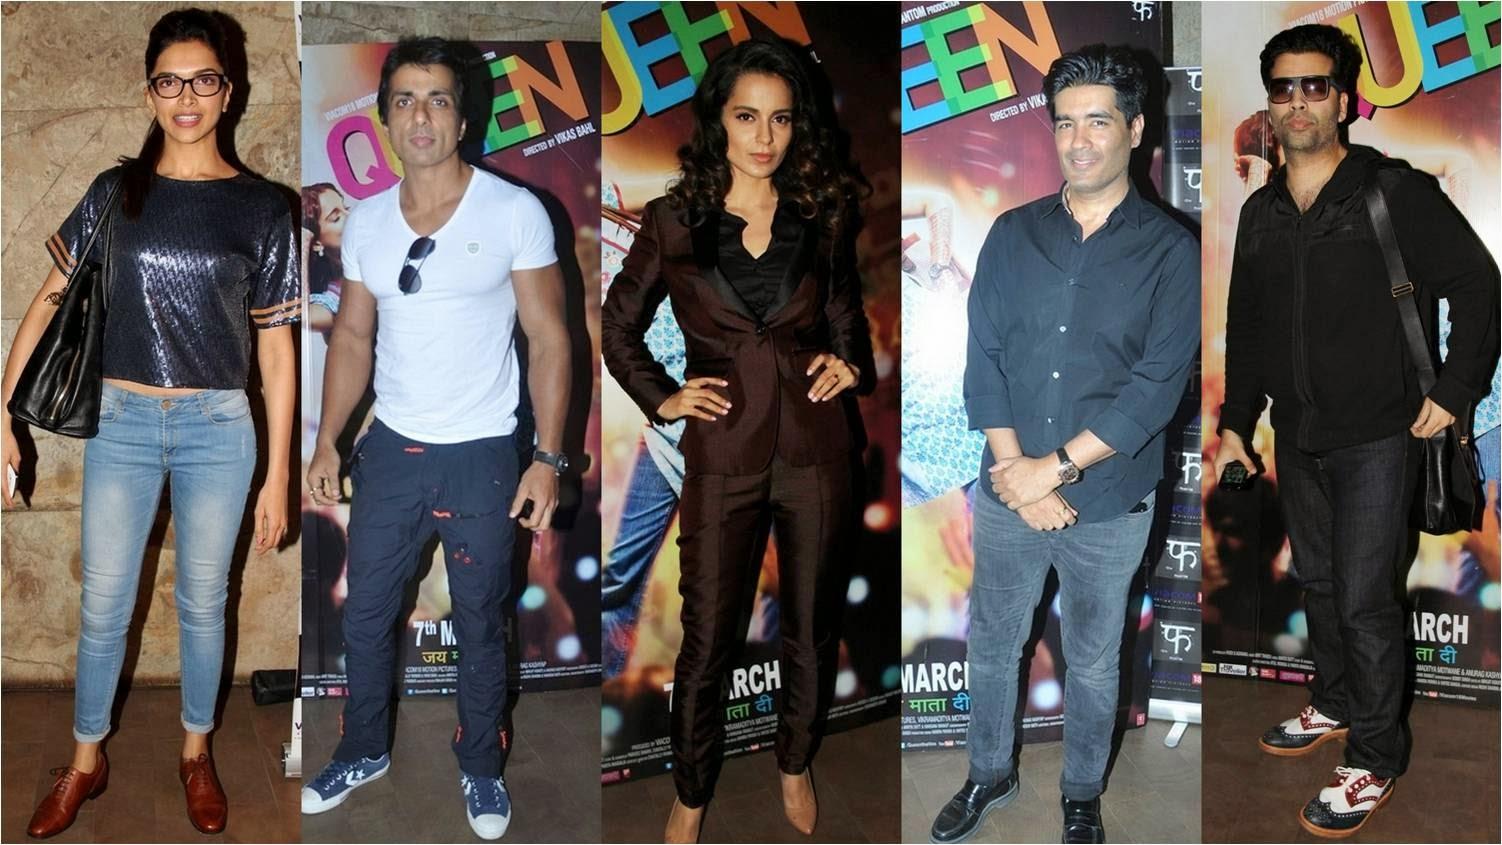 Deepika, Sonu, Kangana, Manish Malhotra and Karan Johar on special screening of Queen at Light Box Theatre